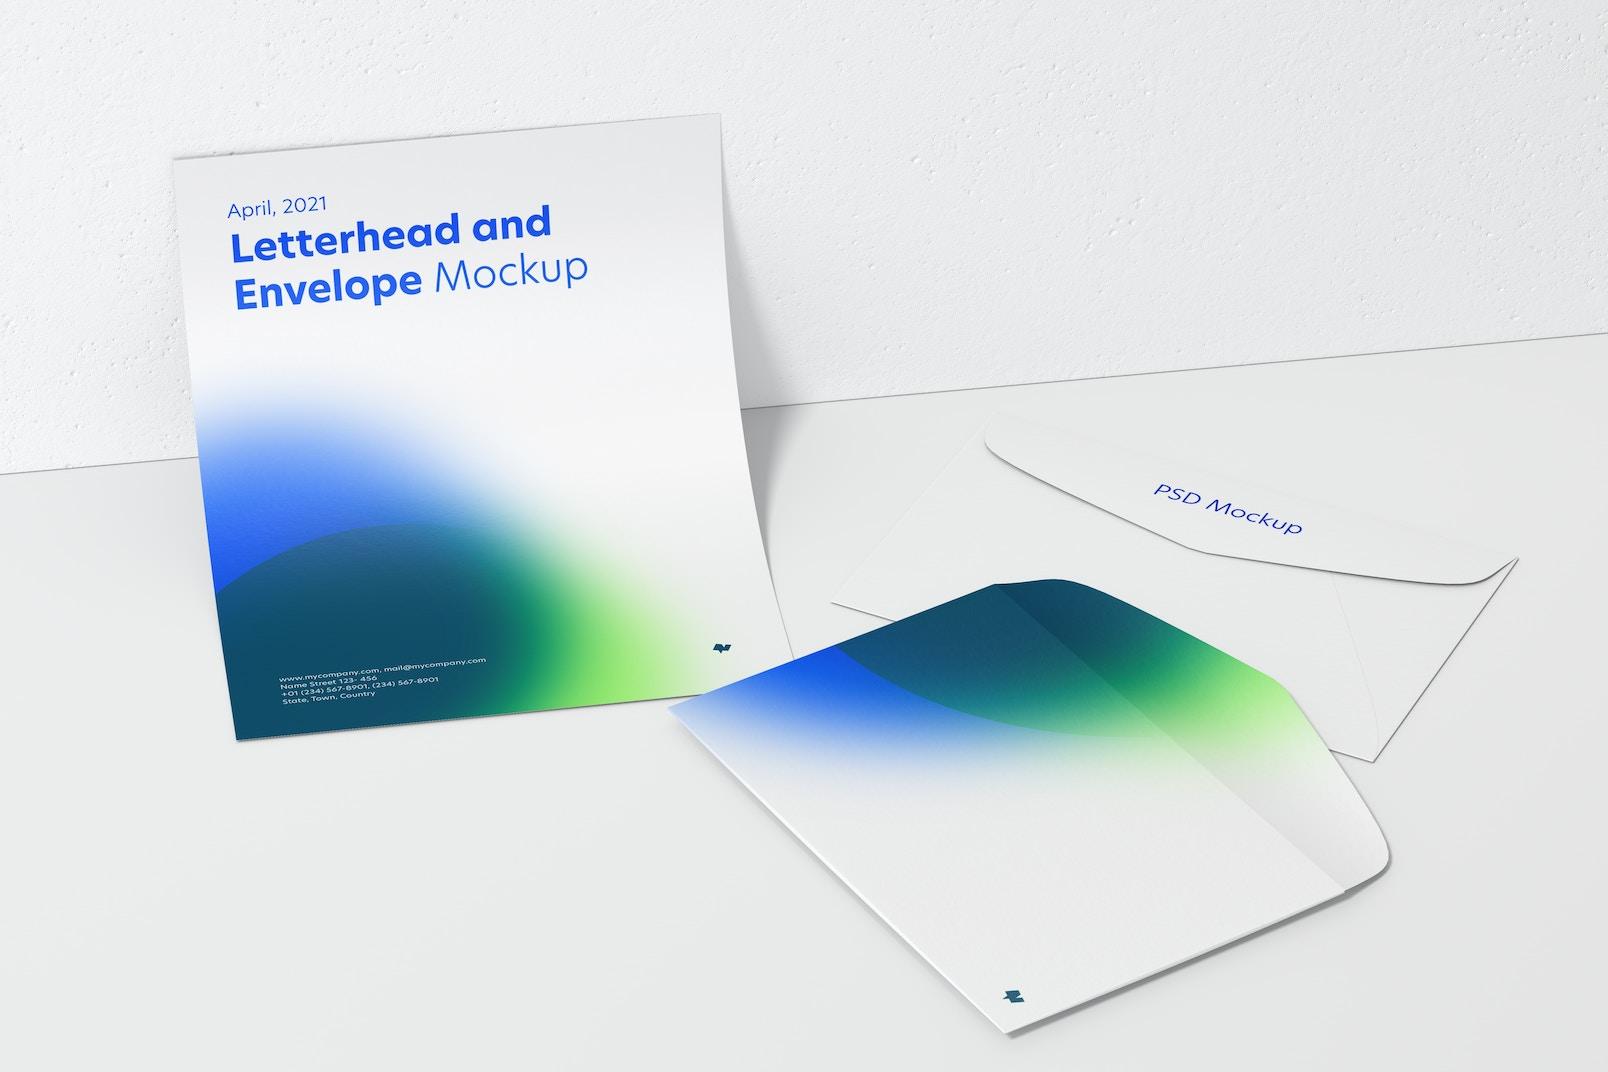 Letterhead and Envelope Mockup, Leaned